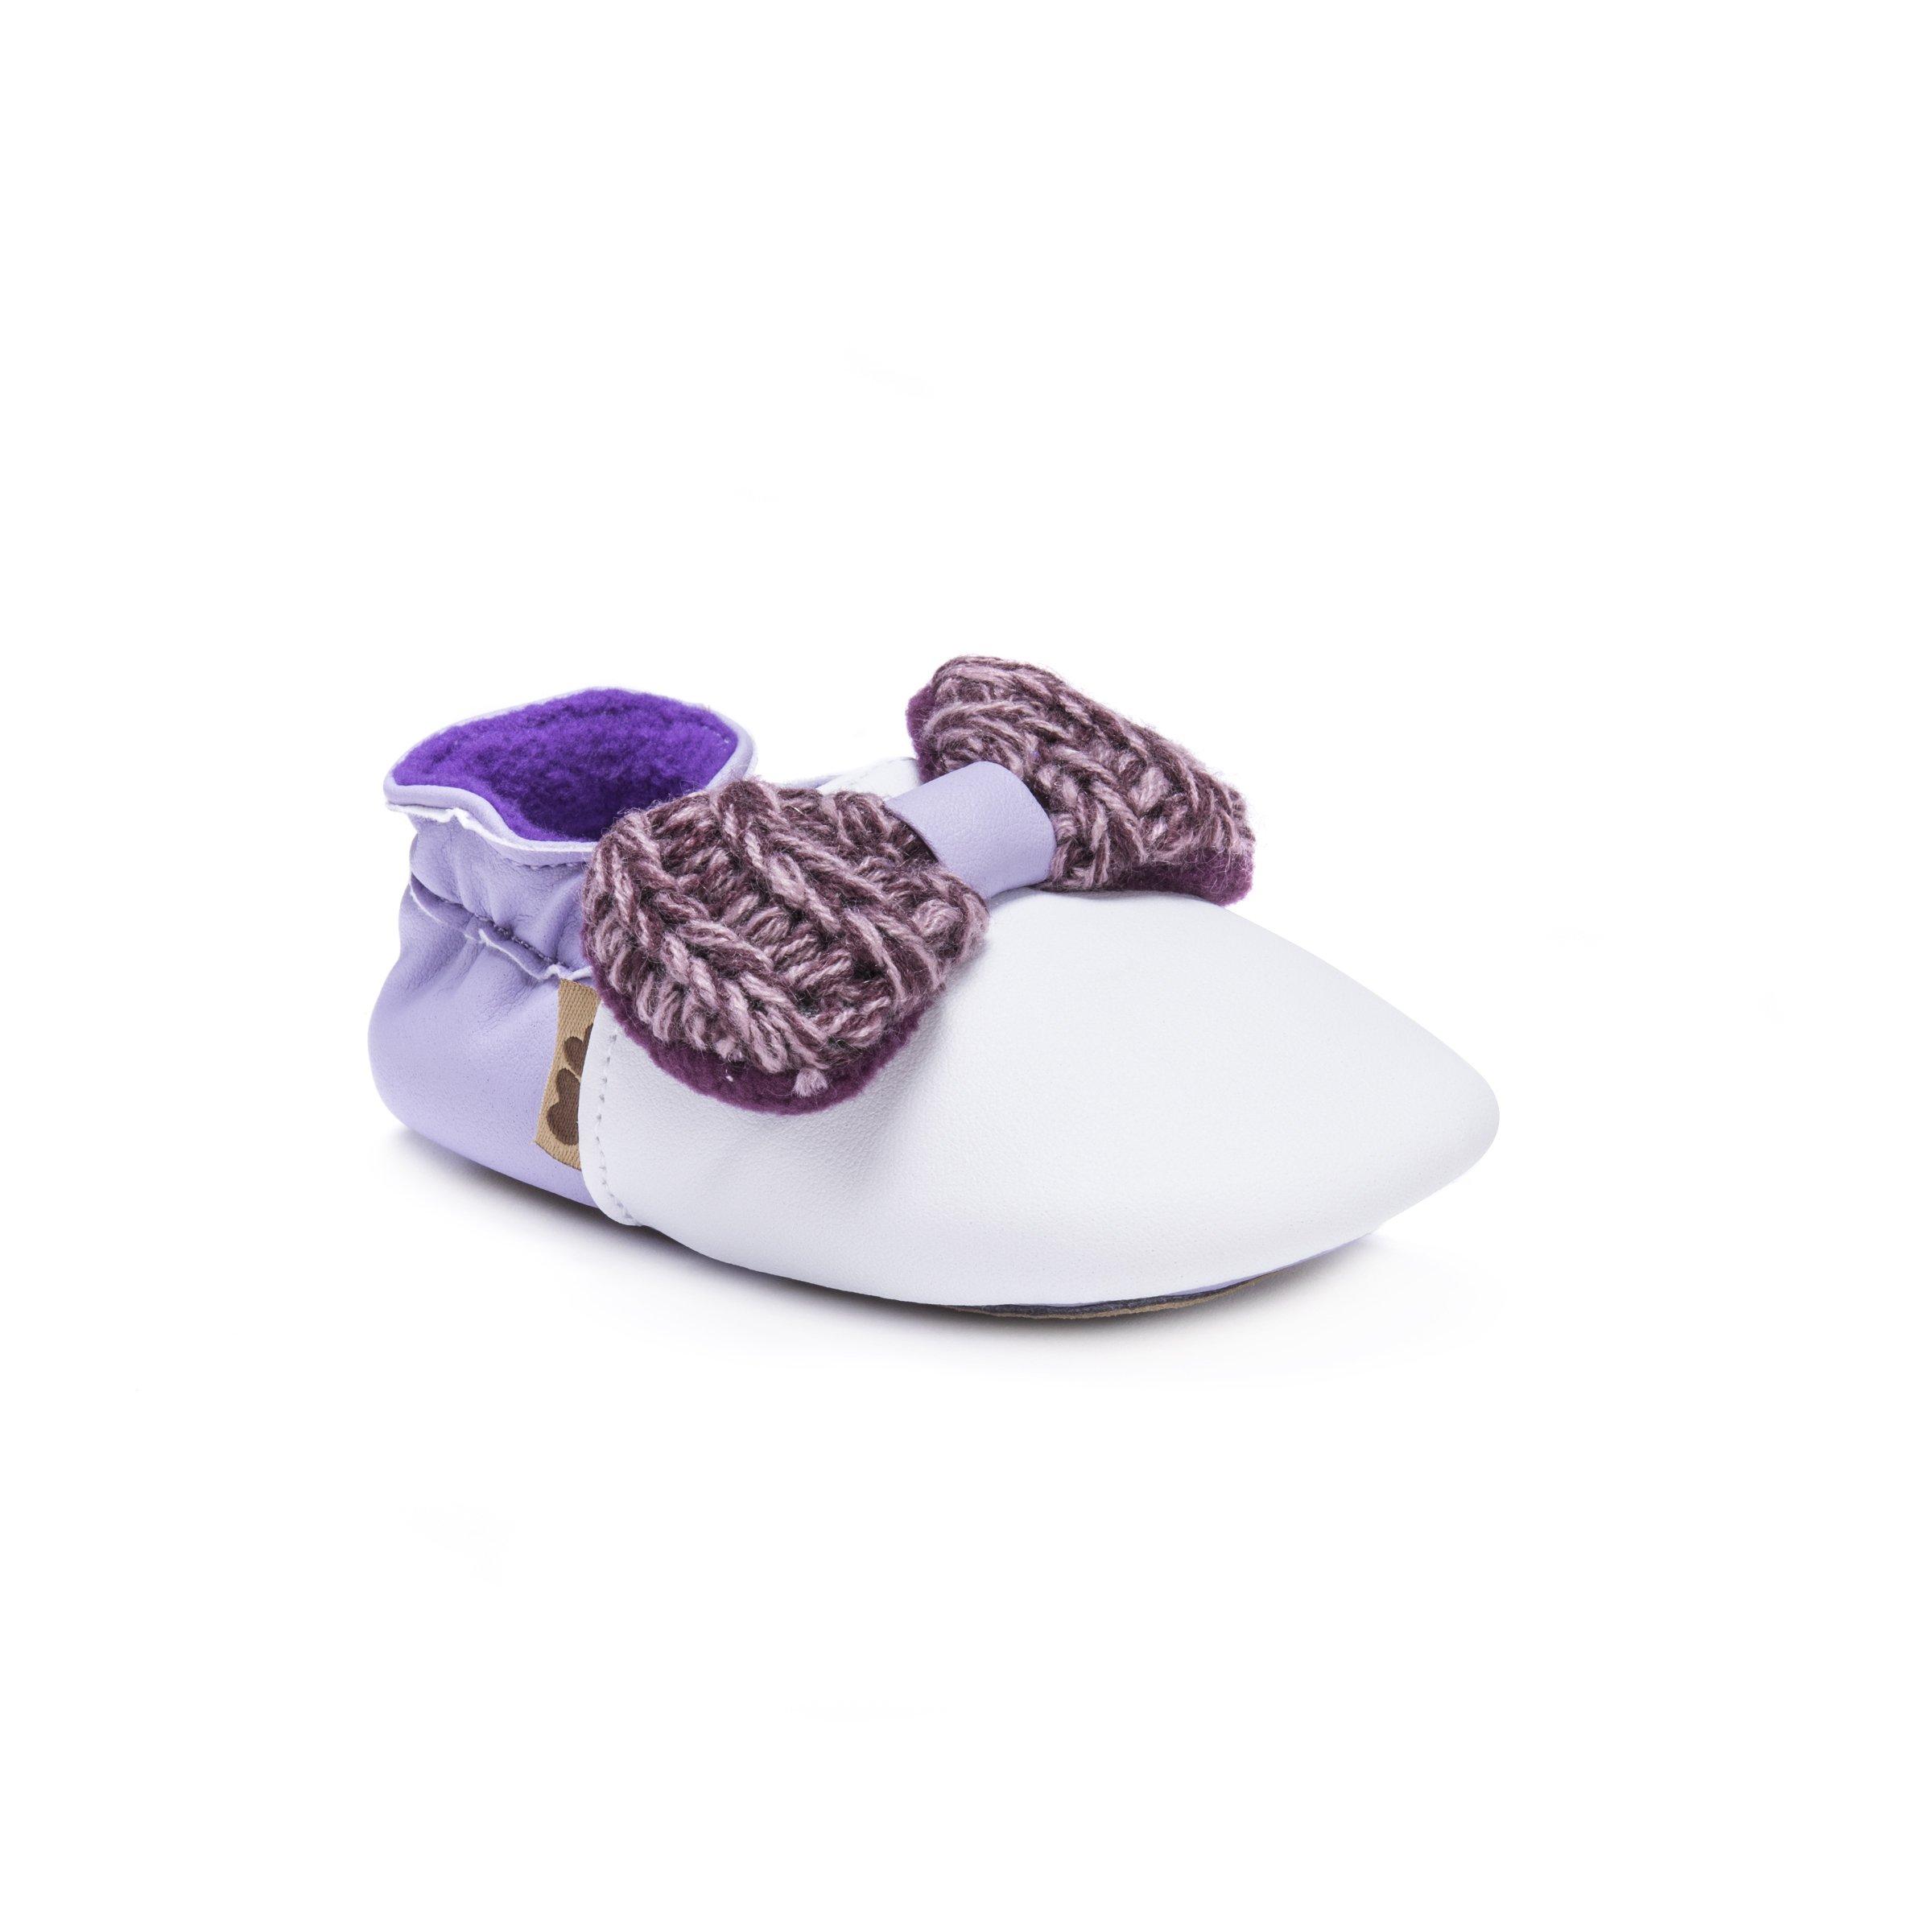 MUK LUKS Girls Baby Soft Shoes-Plum Mary Jane Flat Purple 0-6 Months M US Infant